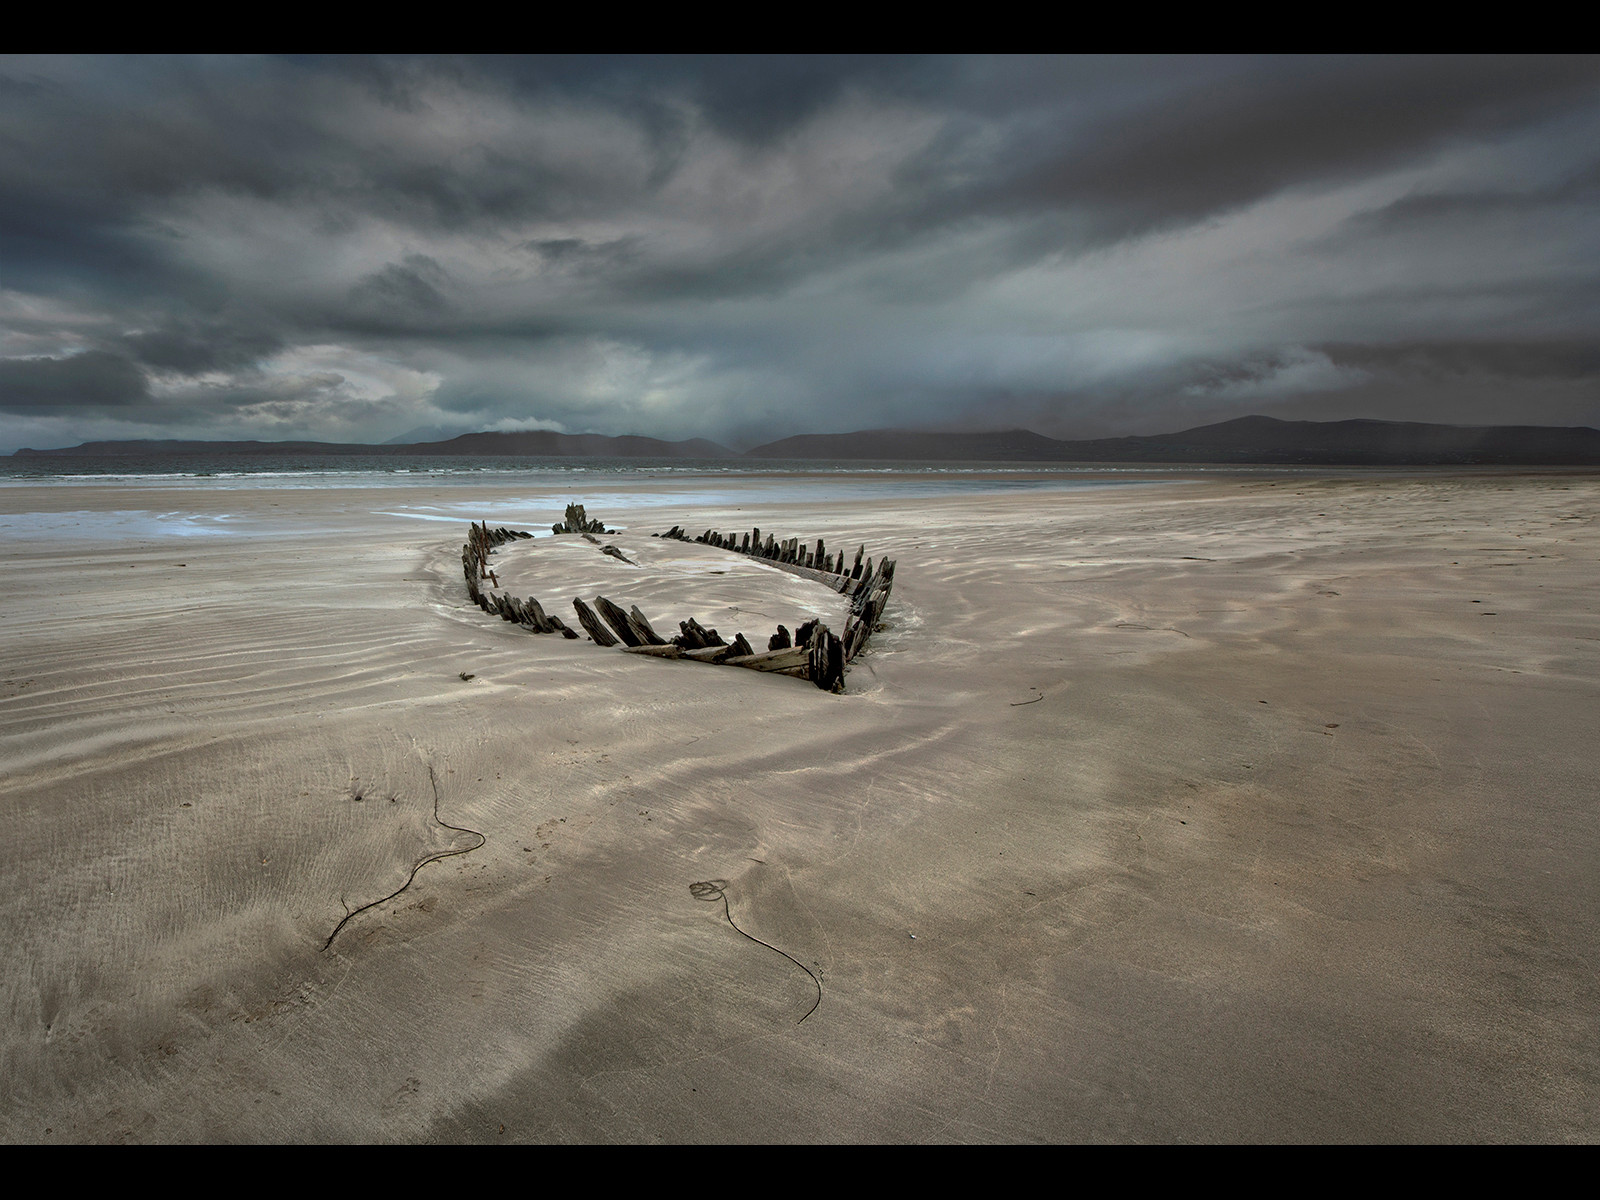 PDI - Wreck of Sunbeam by Dorothy Flint (18 marks)